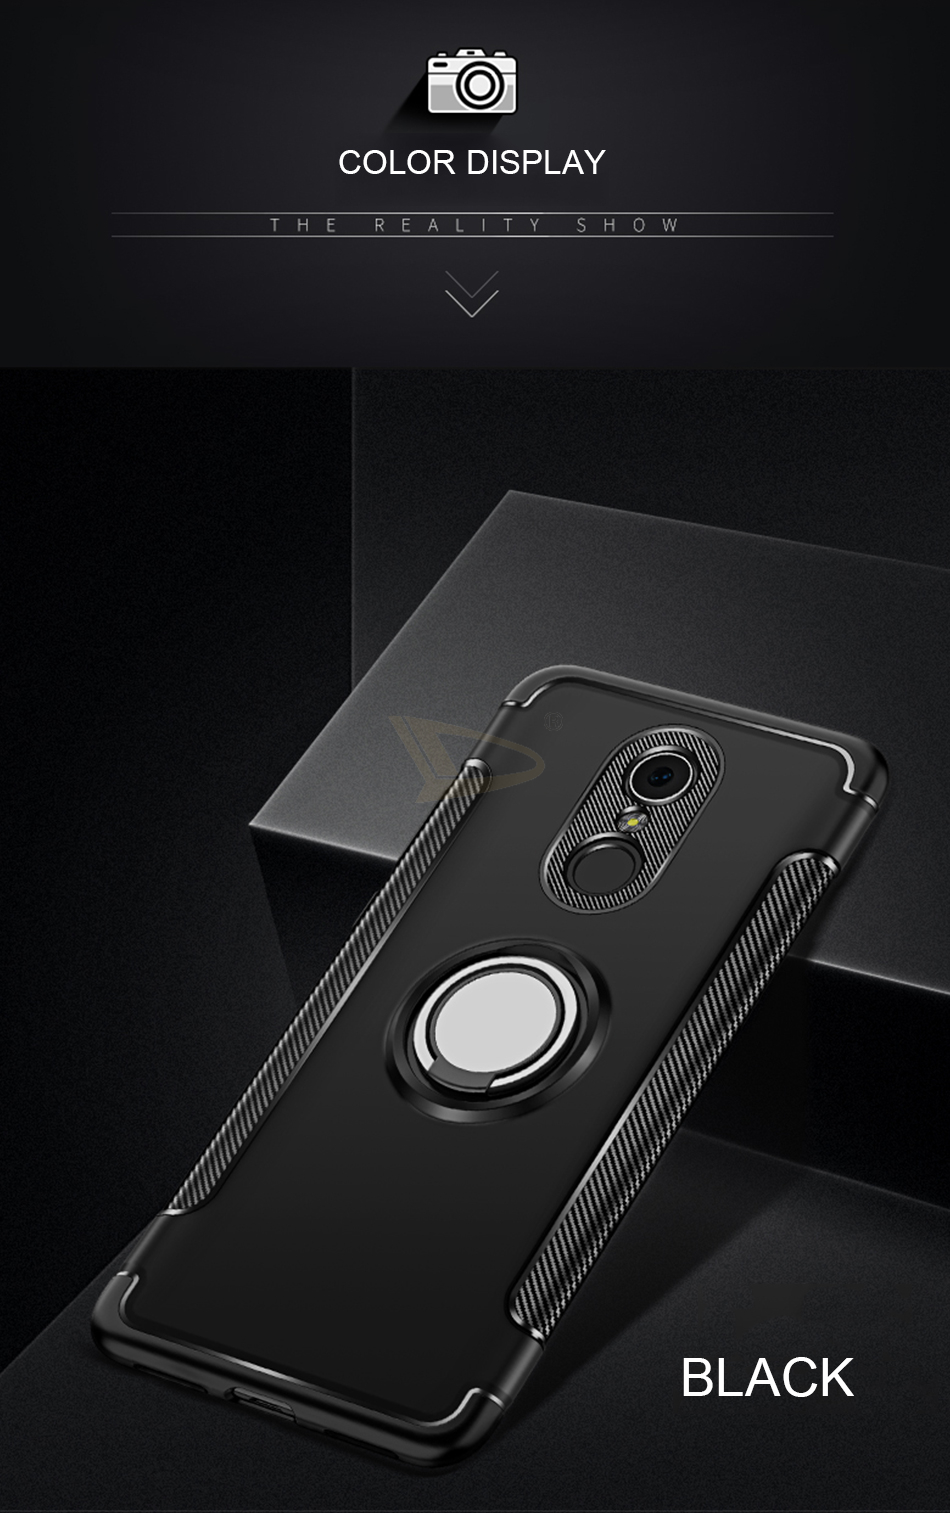 HTB1kjGiKf5TBuNjSspcq6znGFXaN Luxury Soft Shockproof Case For Xiaomi Redmi 4X Note 4 4X Full Cover For Redmi 5 PLus Note 7 Pro 6 6A Hard PC Bracket Ring Cases